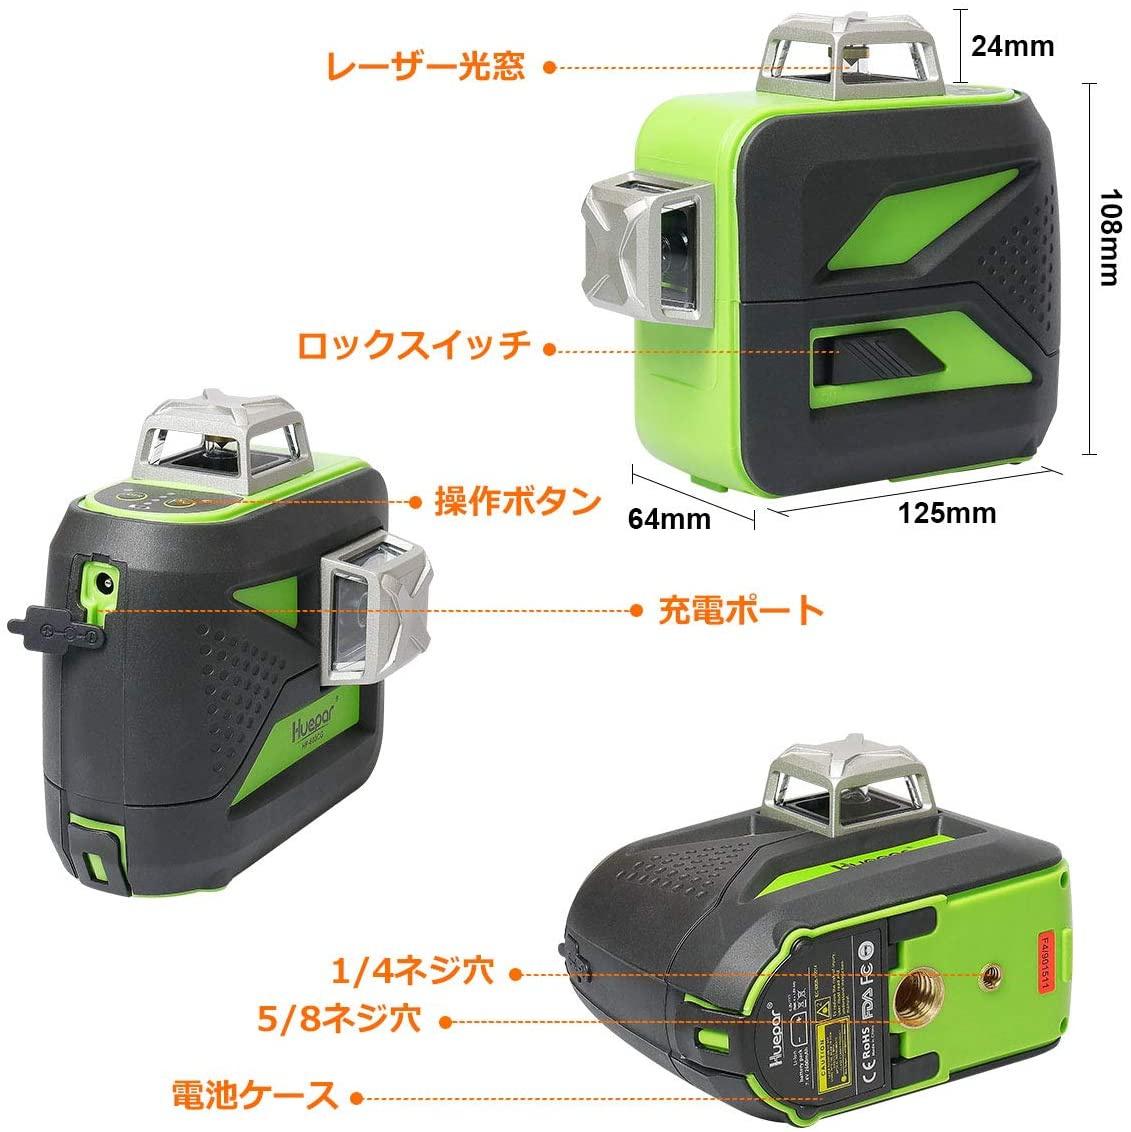 Huepar(ヒューパー) 3x360° レーザー墨出し器 603CGの商品画像8